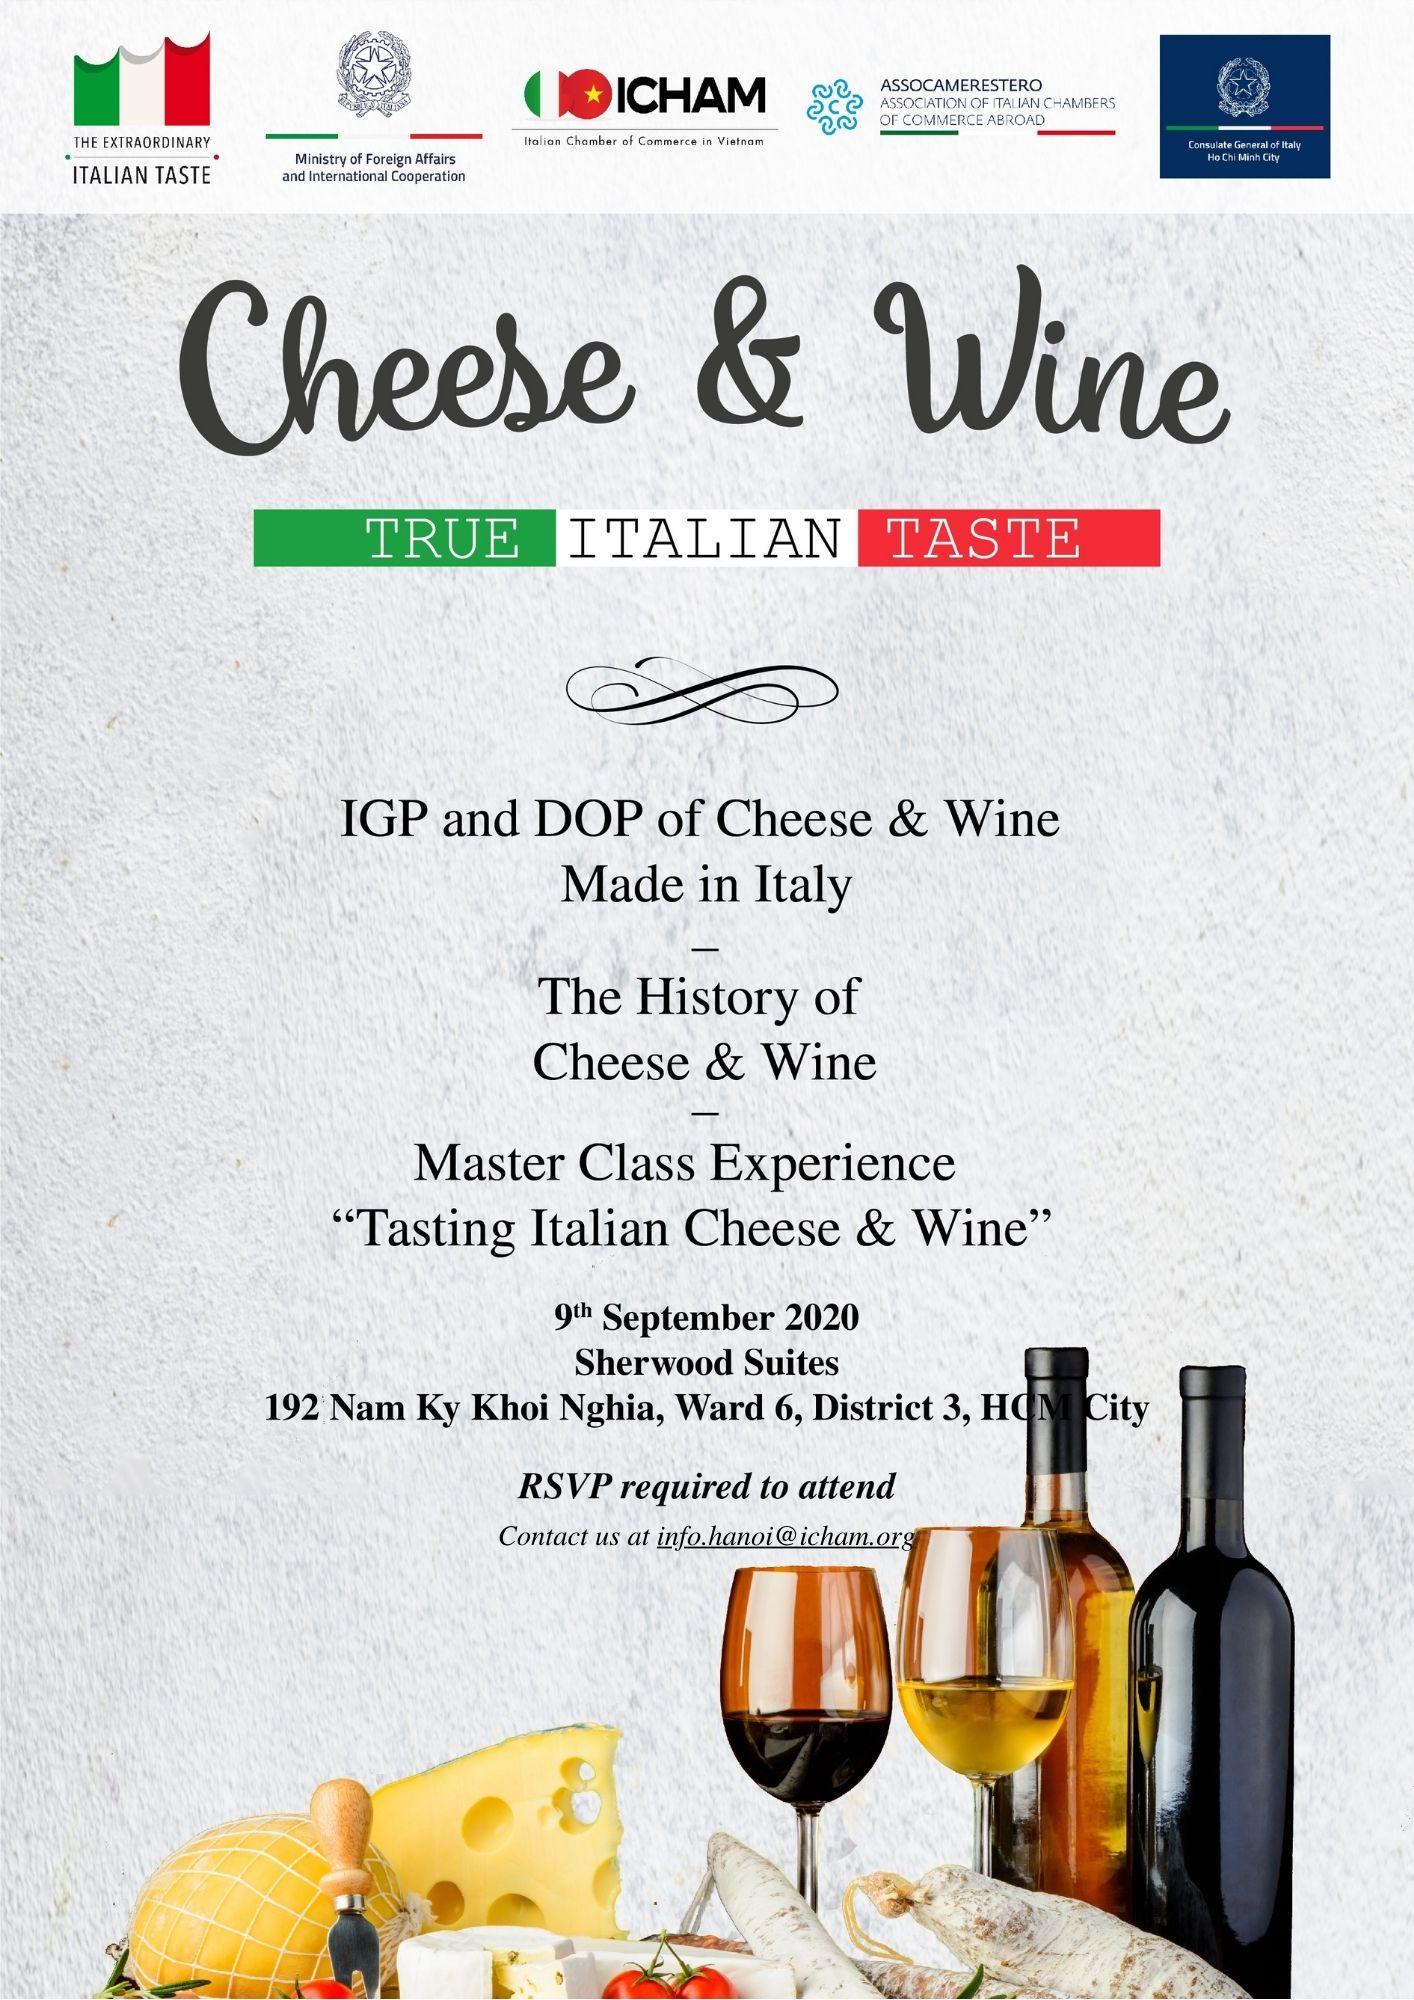 True Italian Taste – Cheese & Wine